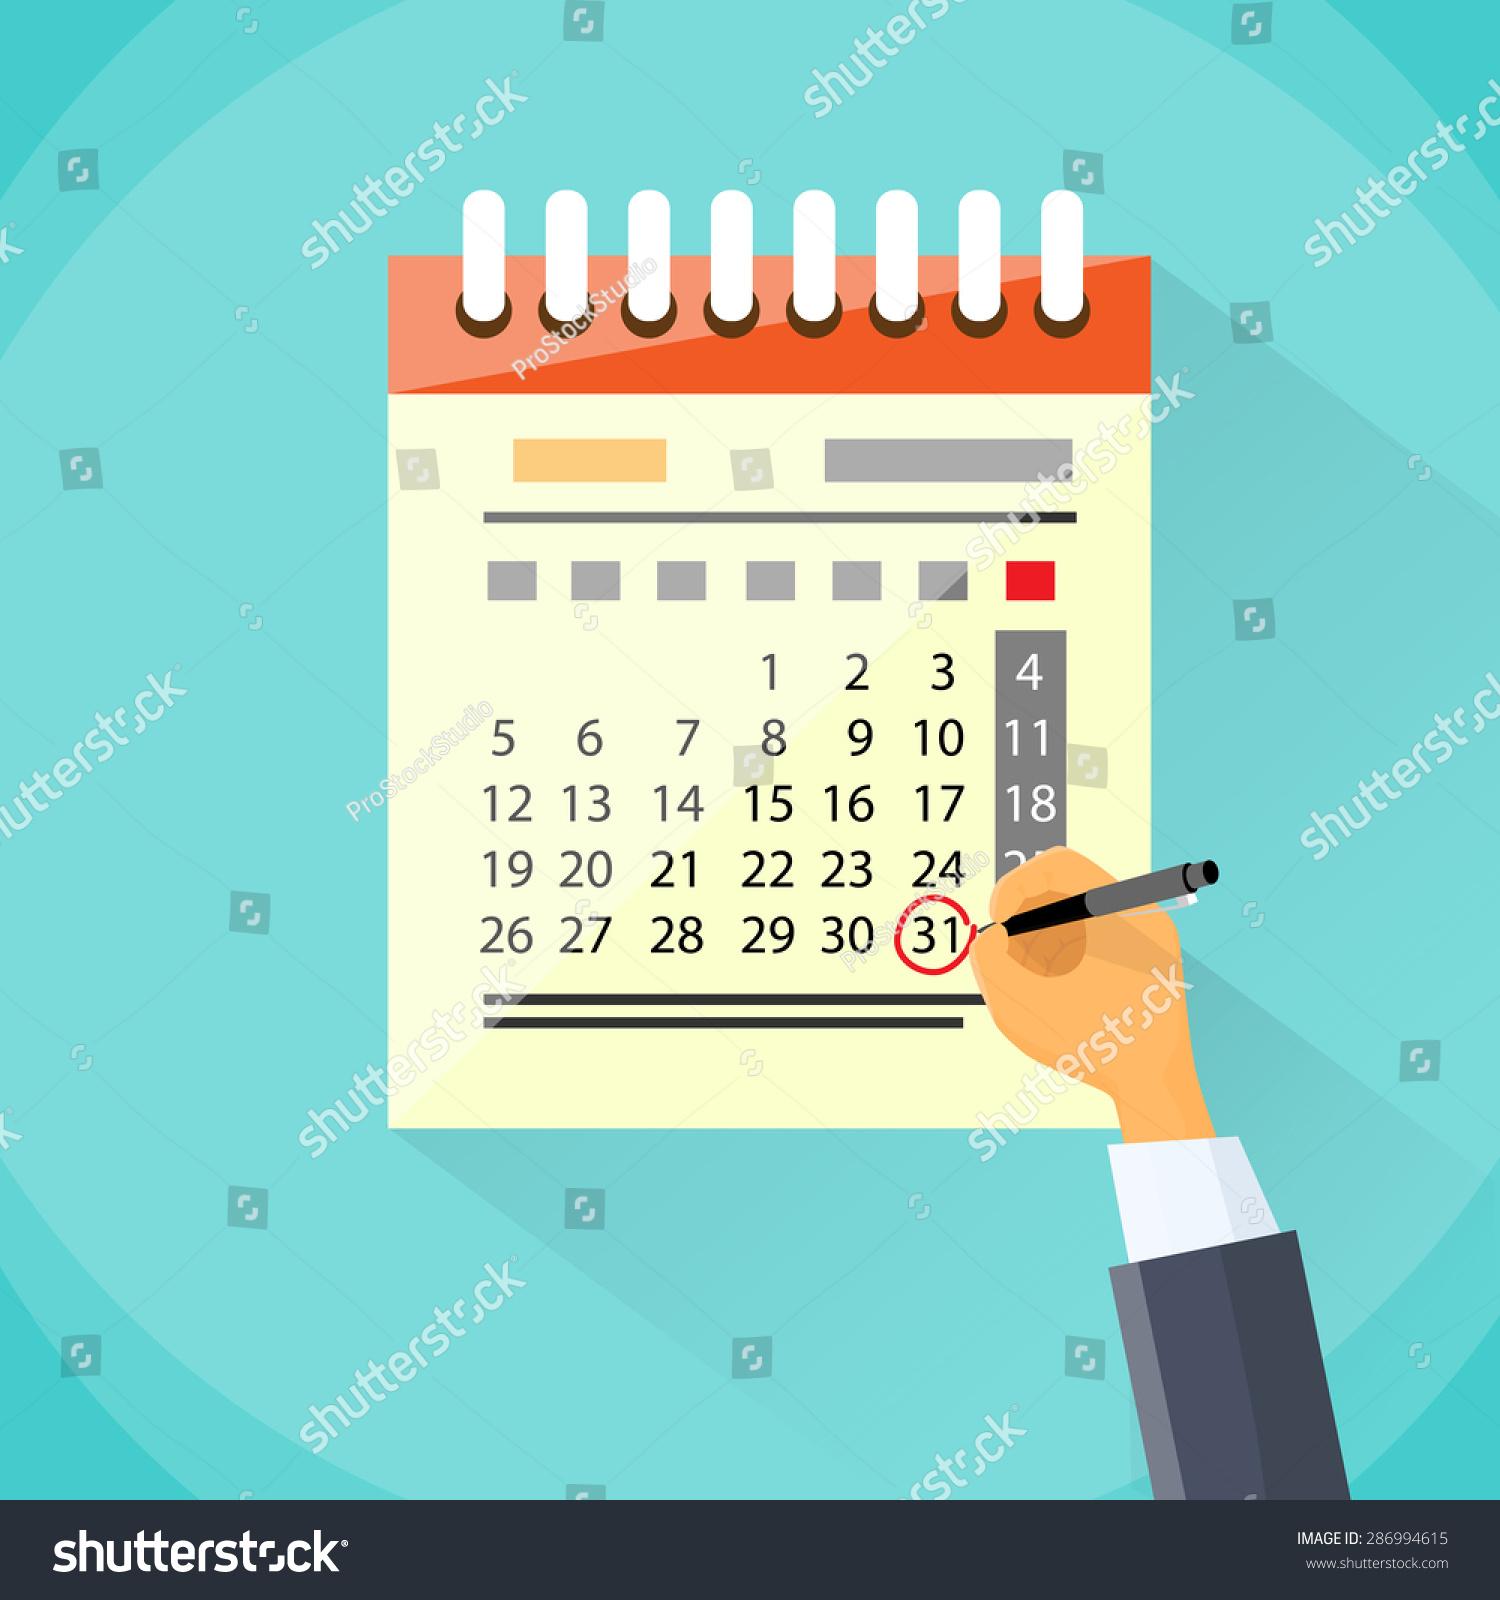 Calendar Drawing Cartoon : Calendar hand draw pen red circle stock vector